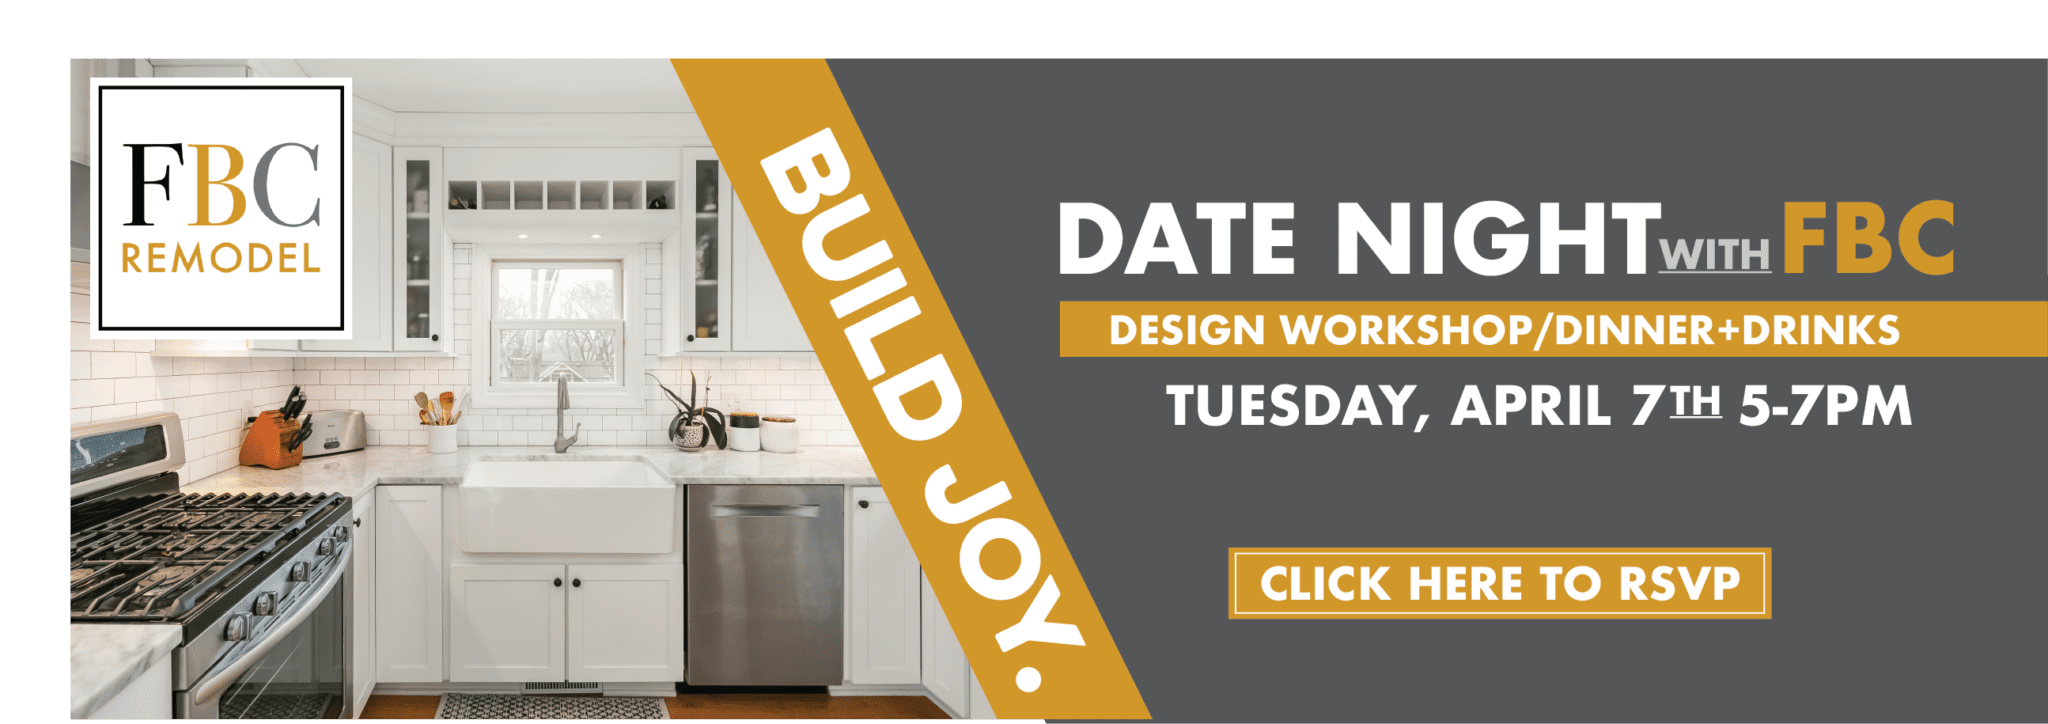 Interior Design Events in Denver CO | FBC Remodel